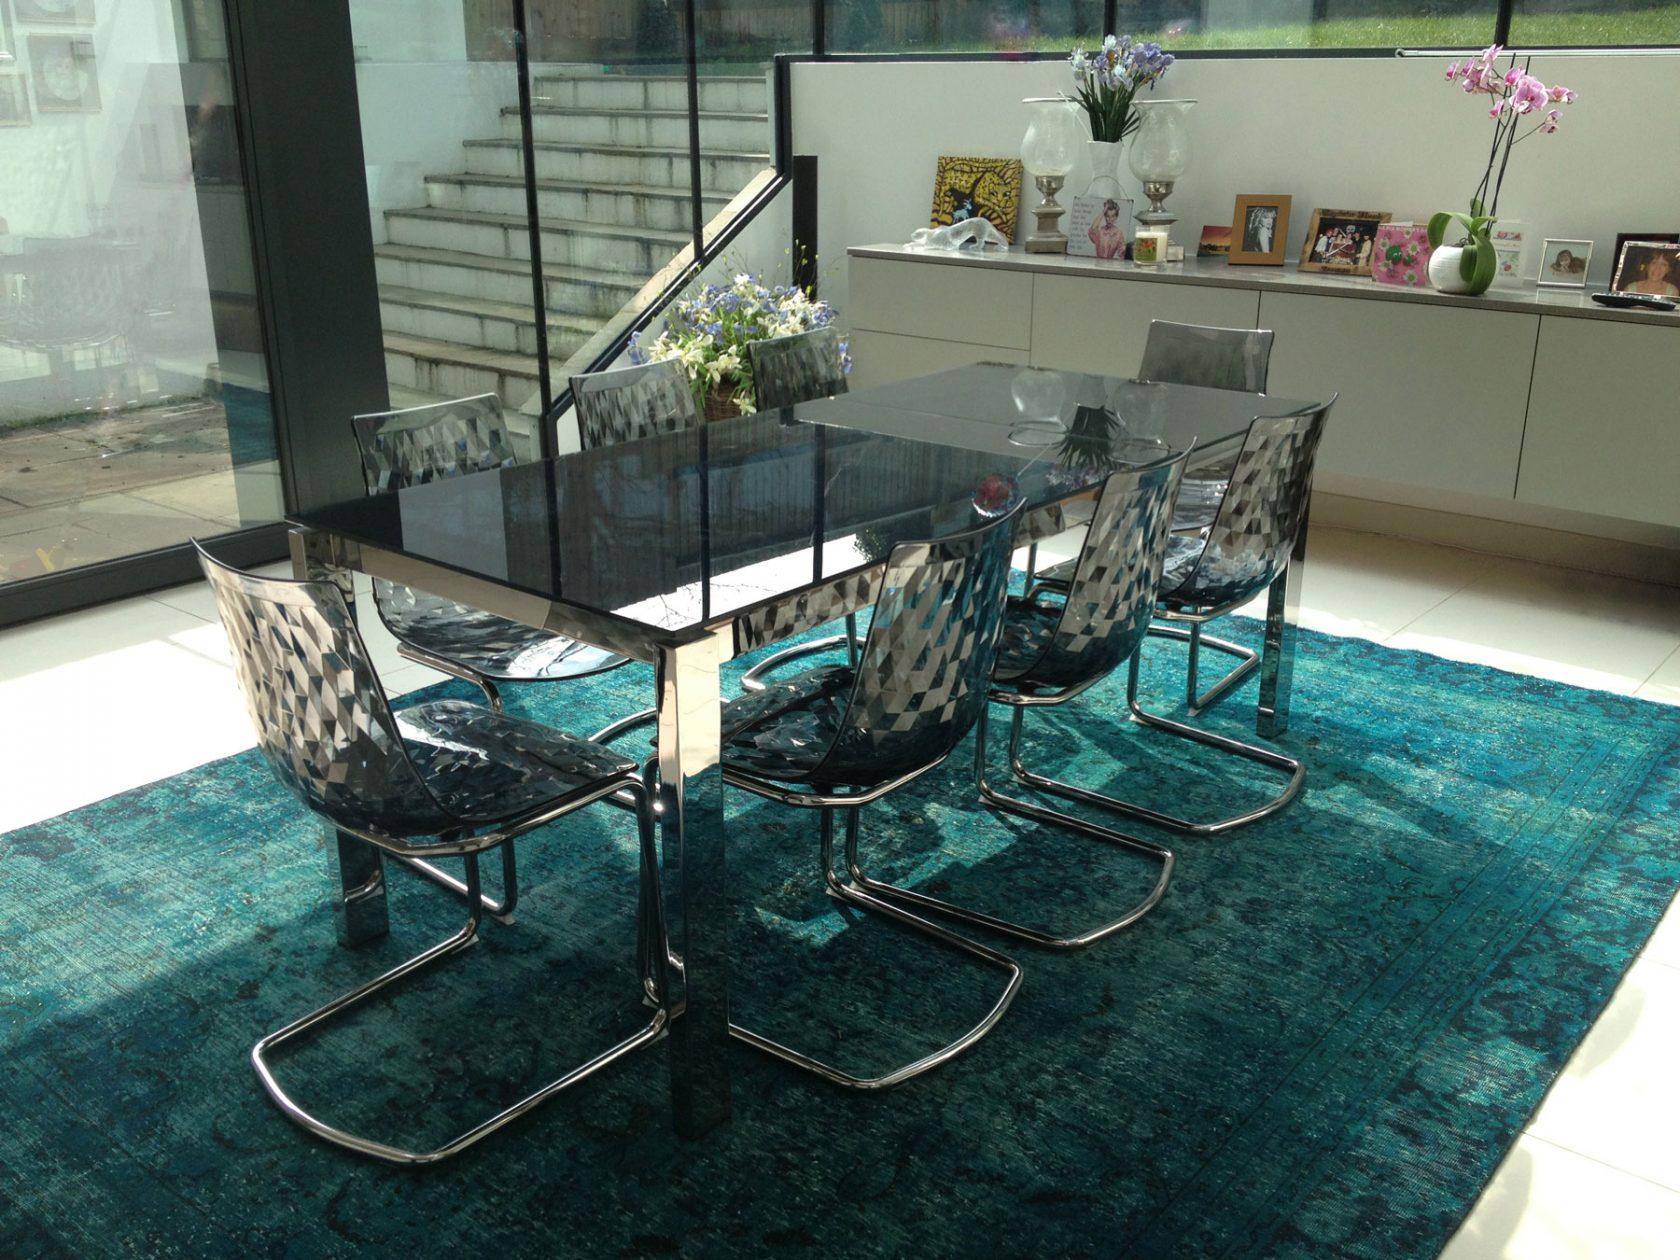 teal over-dyed vintage rug in dining room